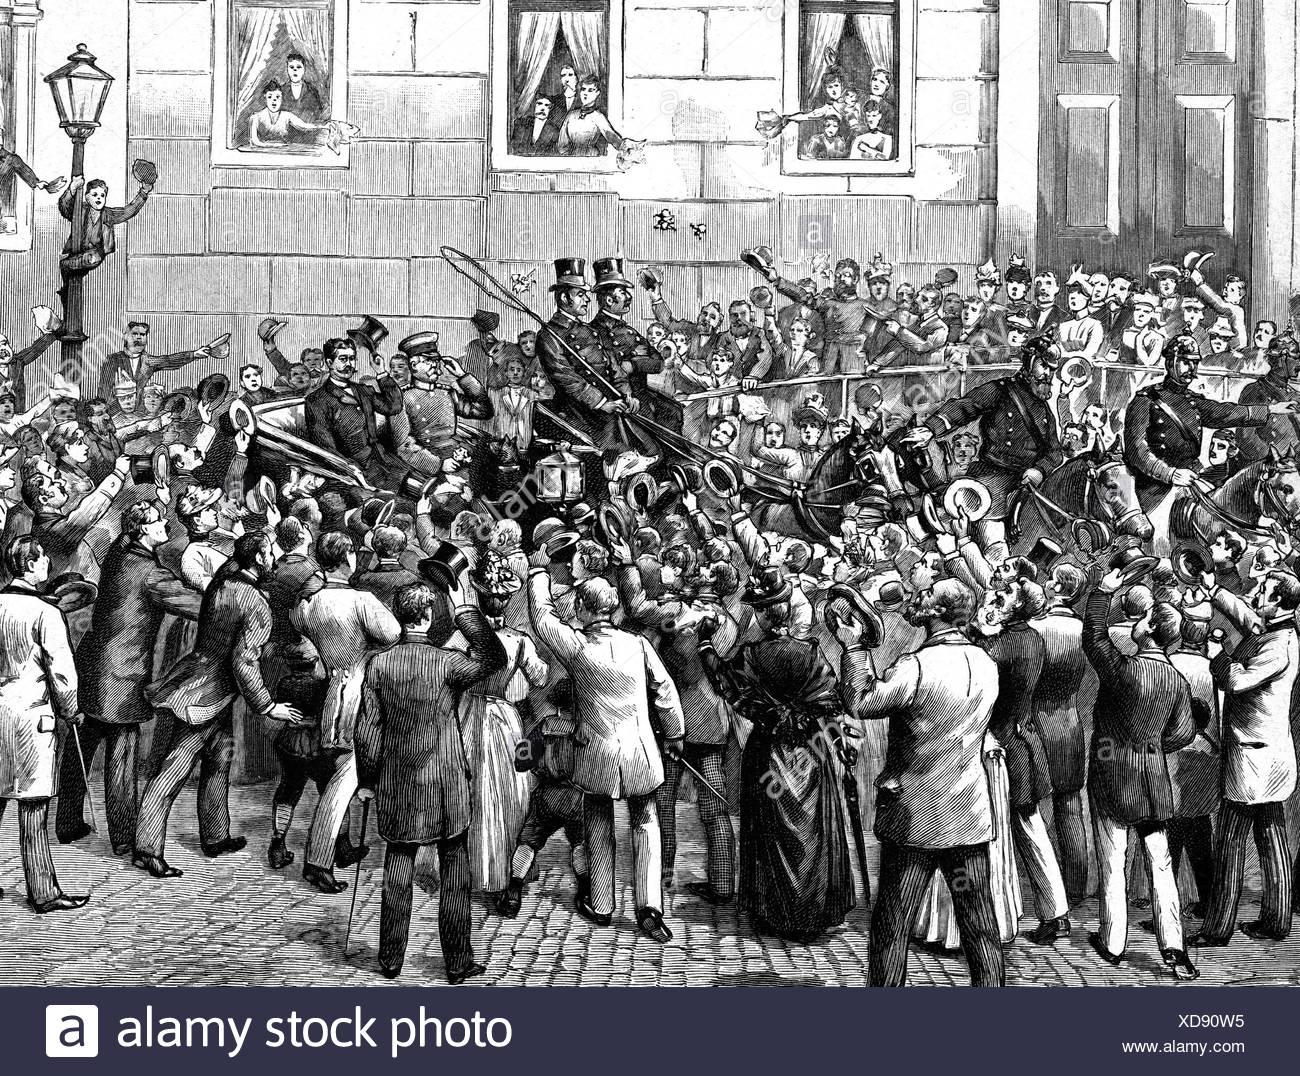 Bismarck, Otto von, 1.4.1815 - 30.7.1898, German politician, Chancellor of the German Empire 1871 - 1890, his discharge 1890, de Stockbild